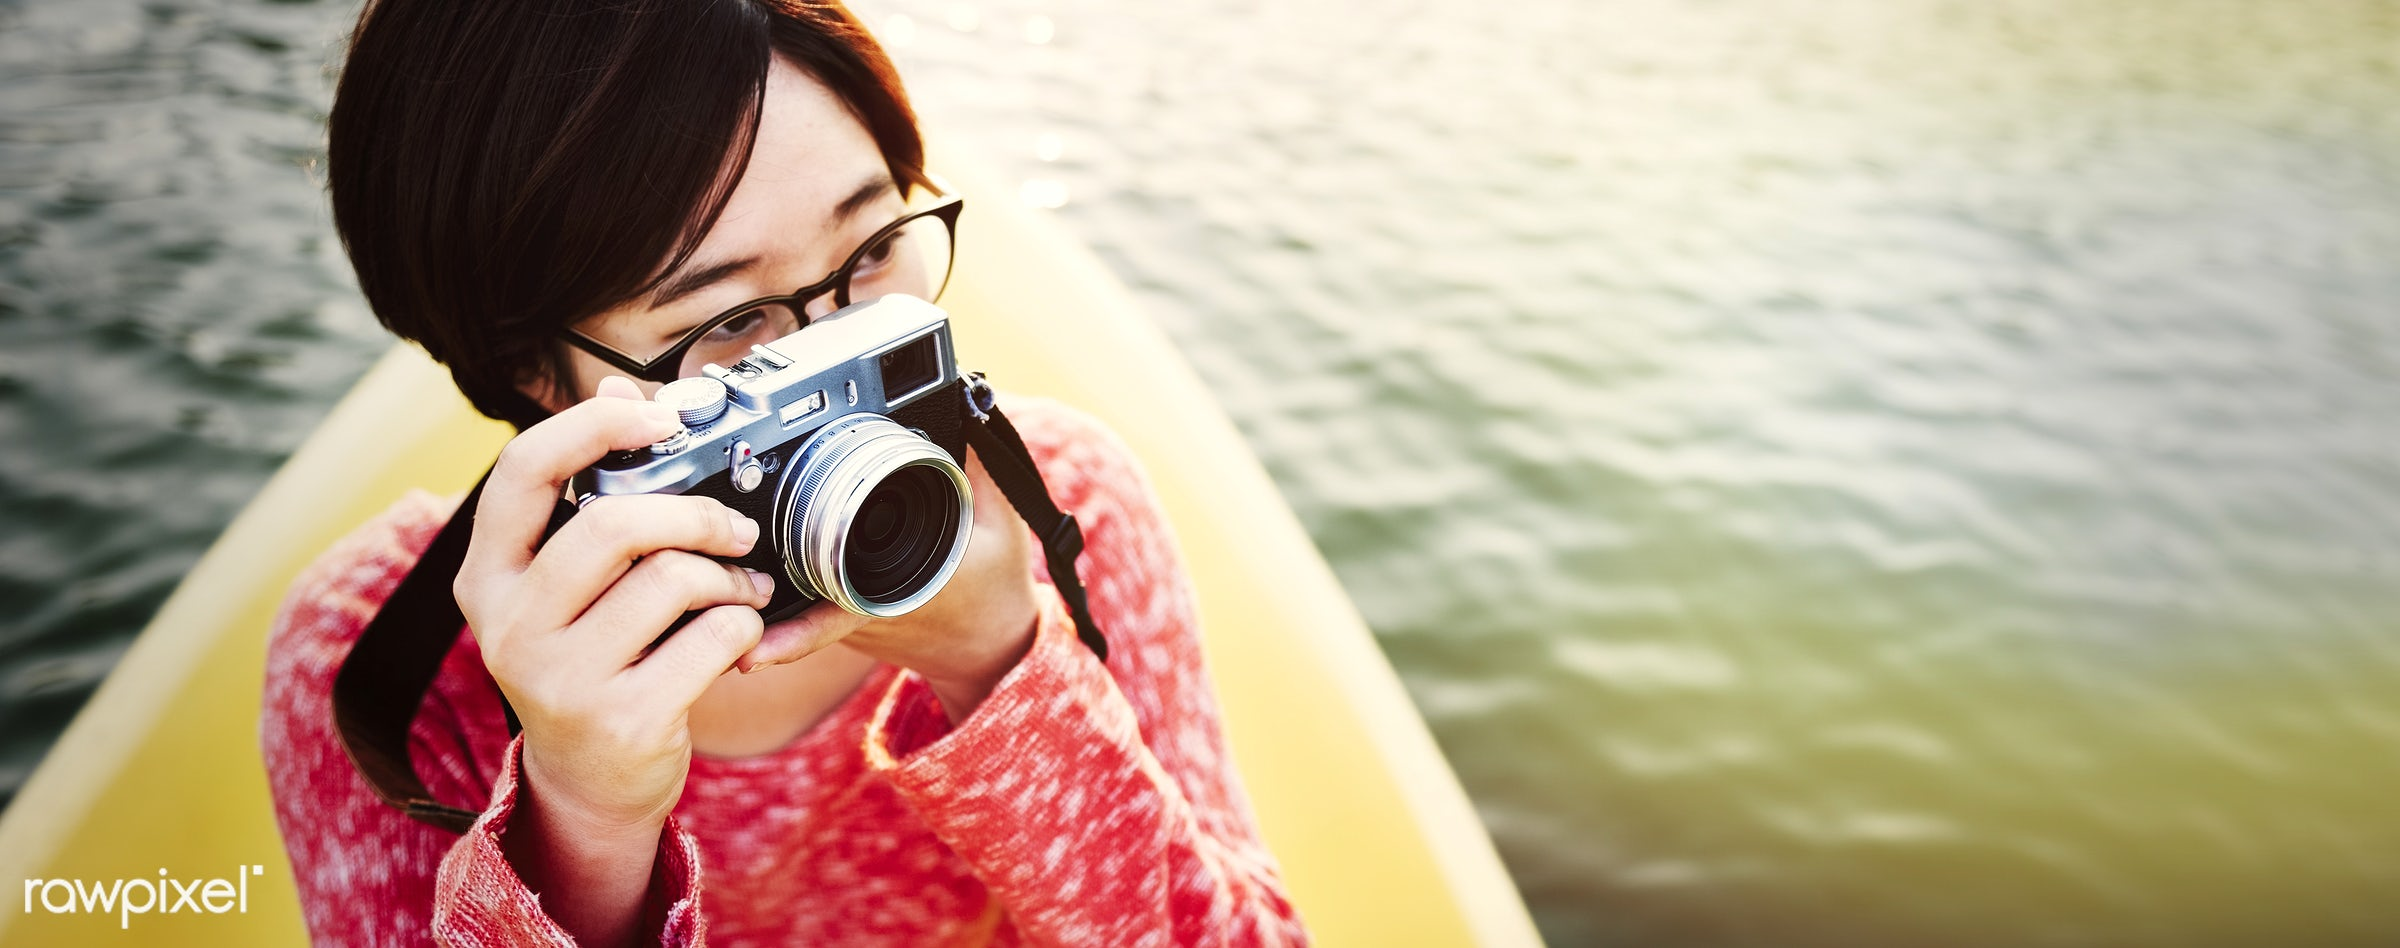 activity, adventure, asian ethnicity, beautiful, boat, camera, canoe, canoeing, casual, destination, enjoyment, freedom, fun...